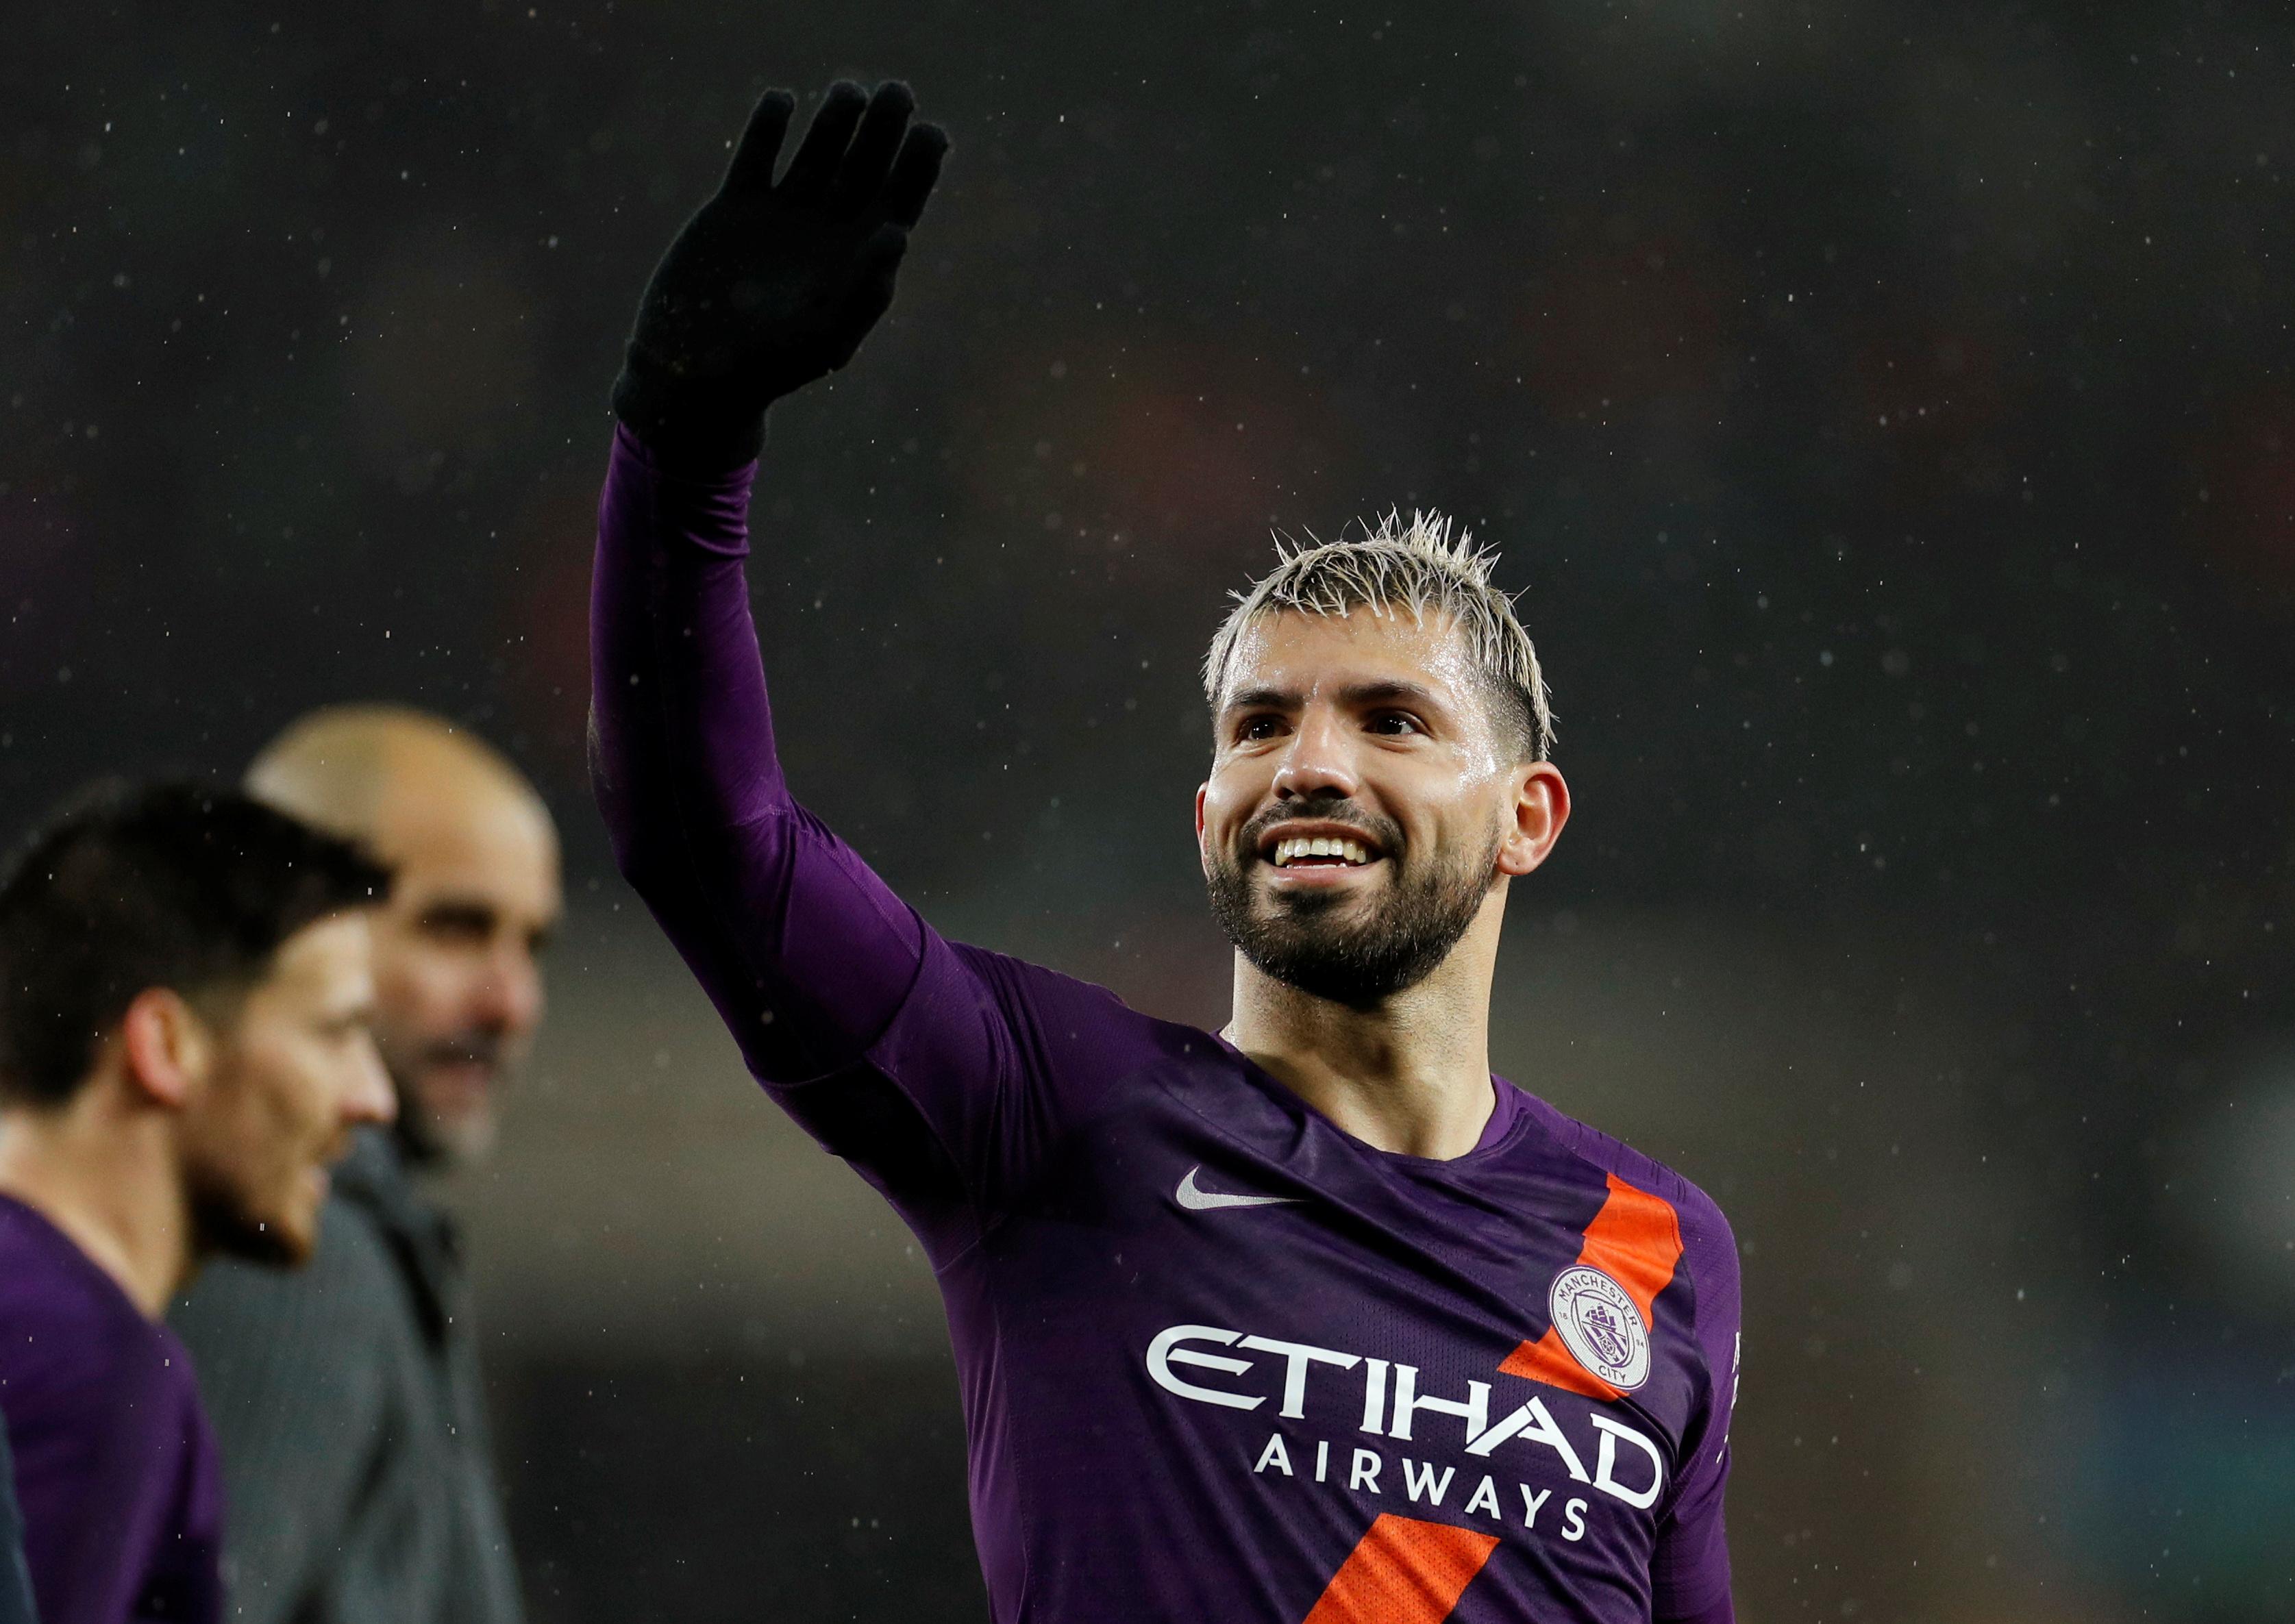 Soccer: Three Manchester City players make six-man shortlist for PFA award